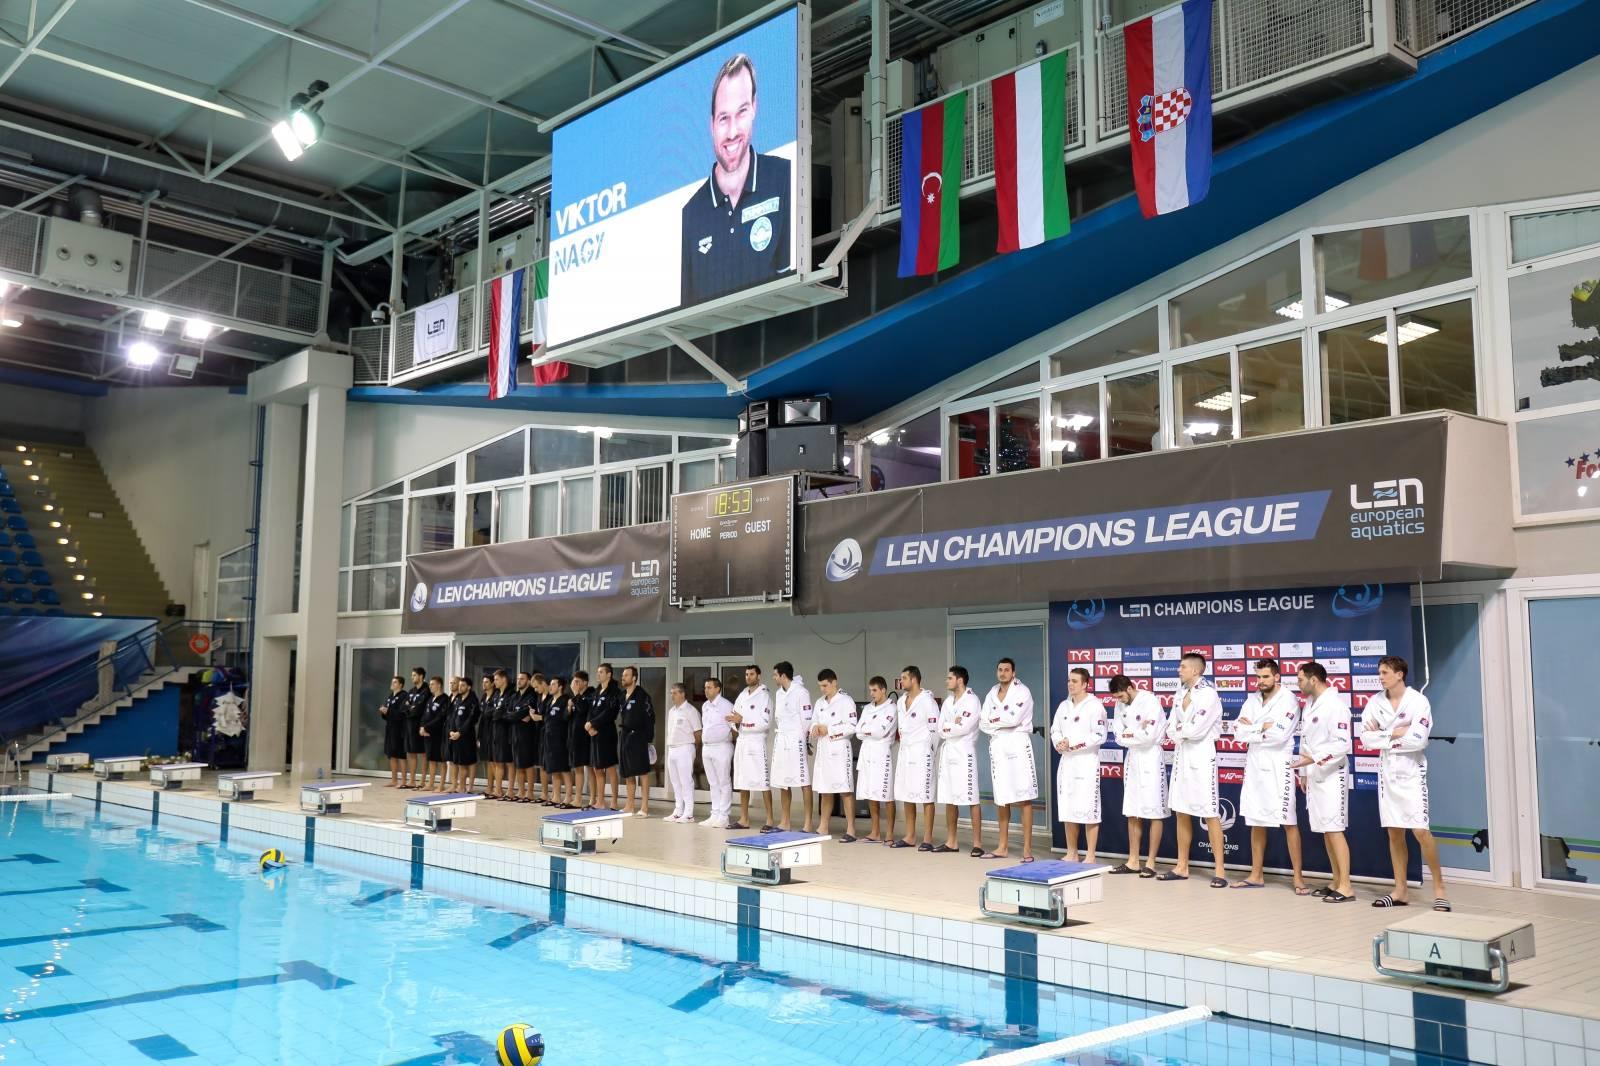 Jug svladao Szolnoki Dozsu rezultatom 14:11 u LEN Ligi prvaka